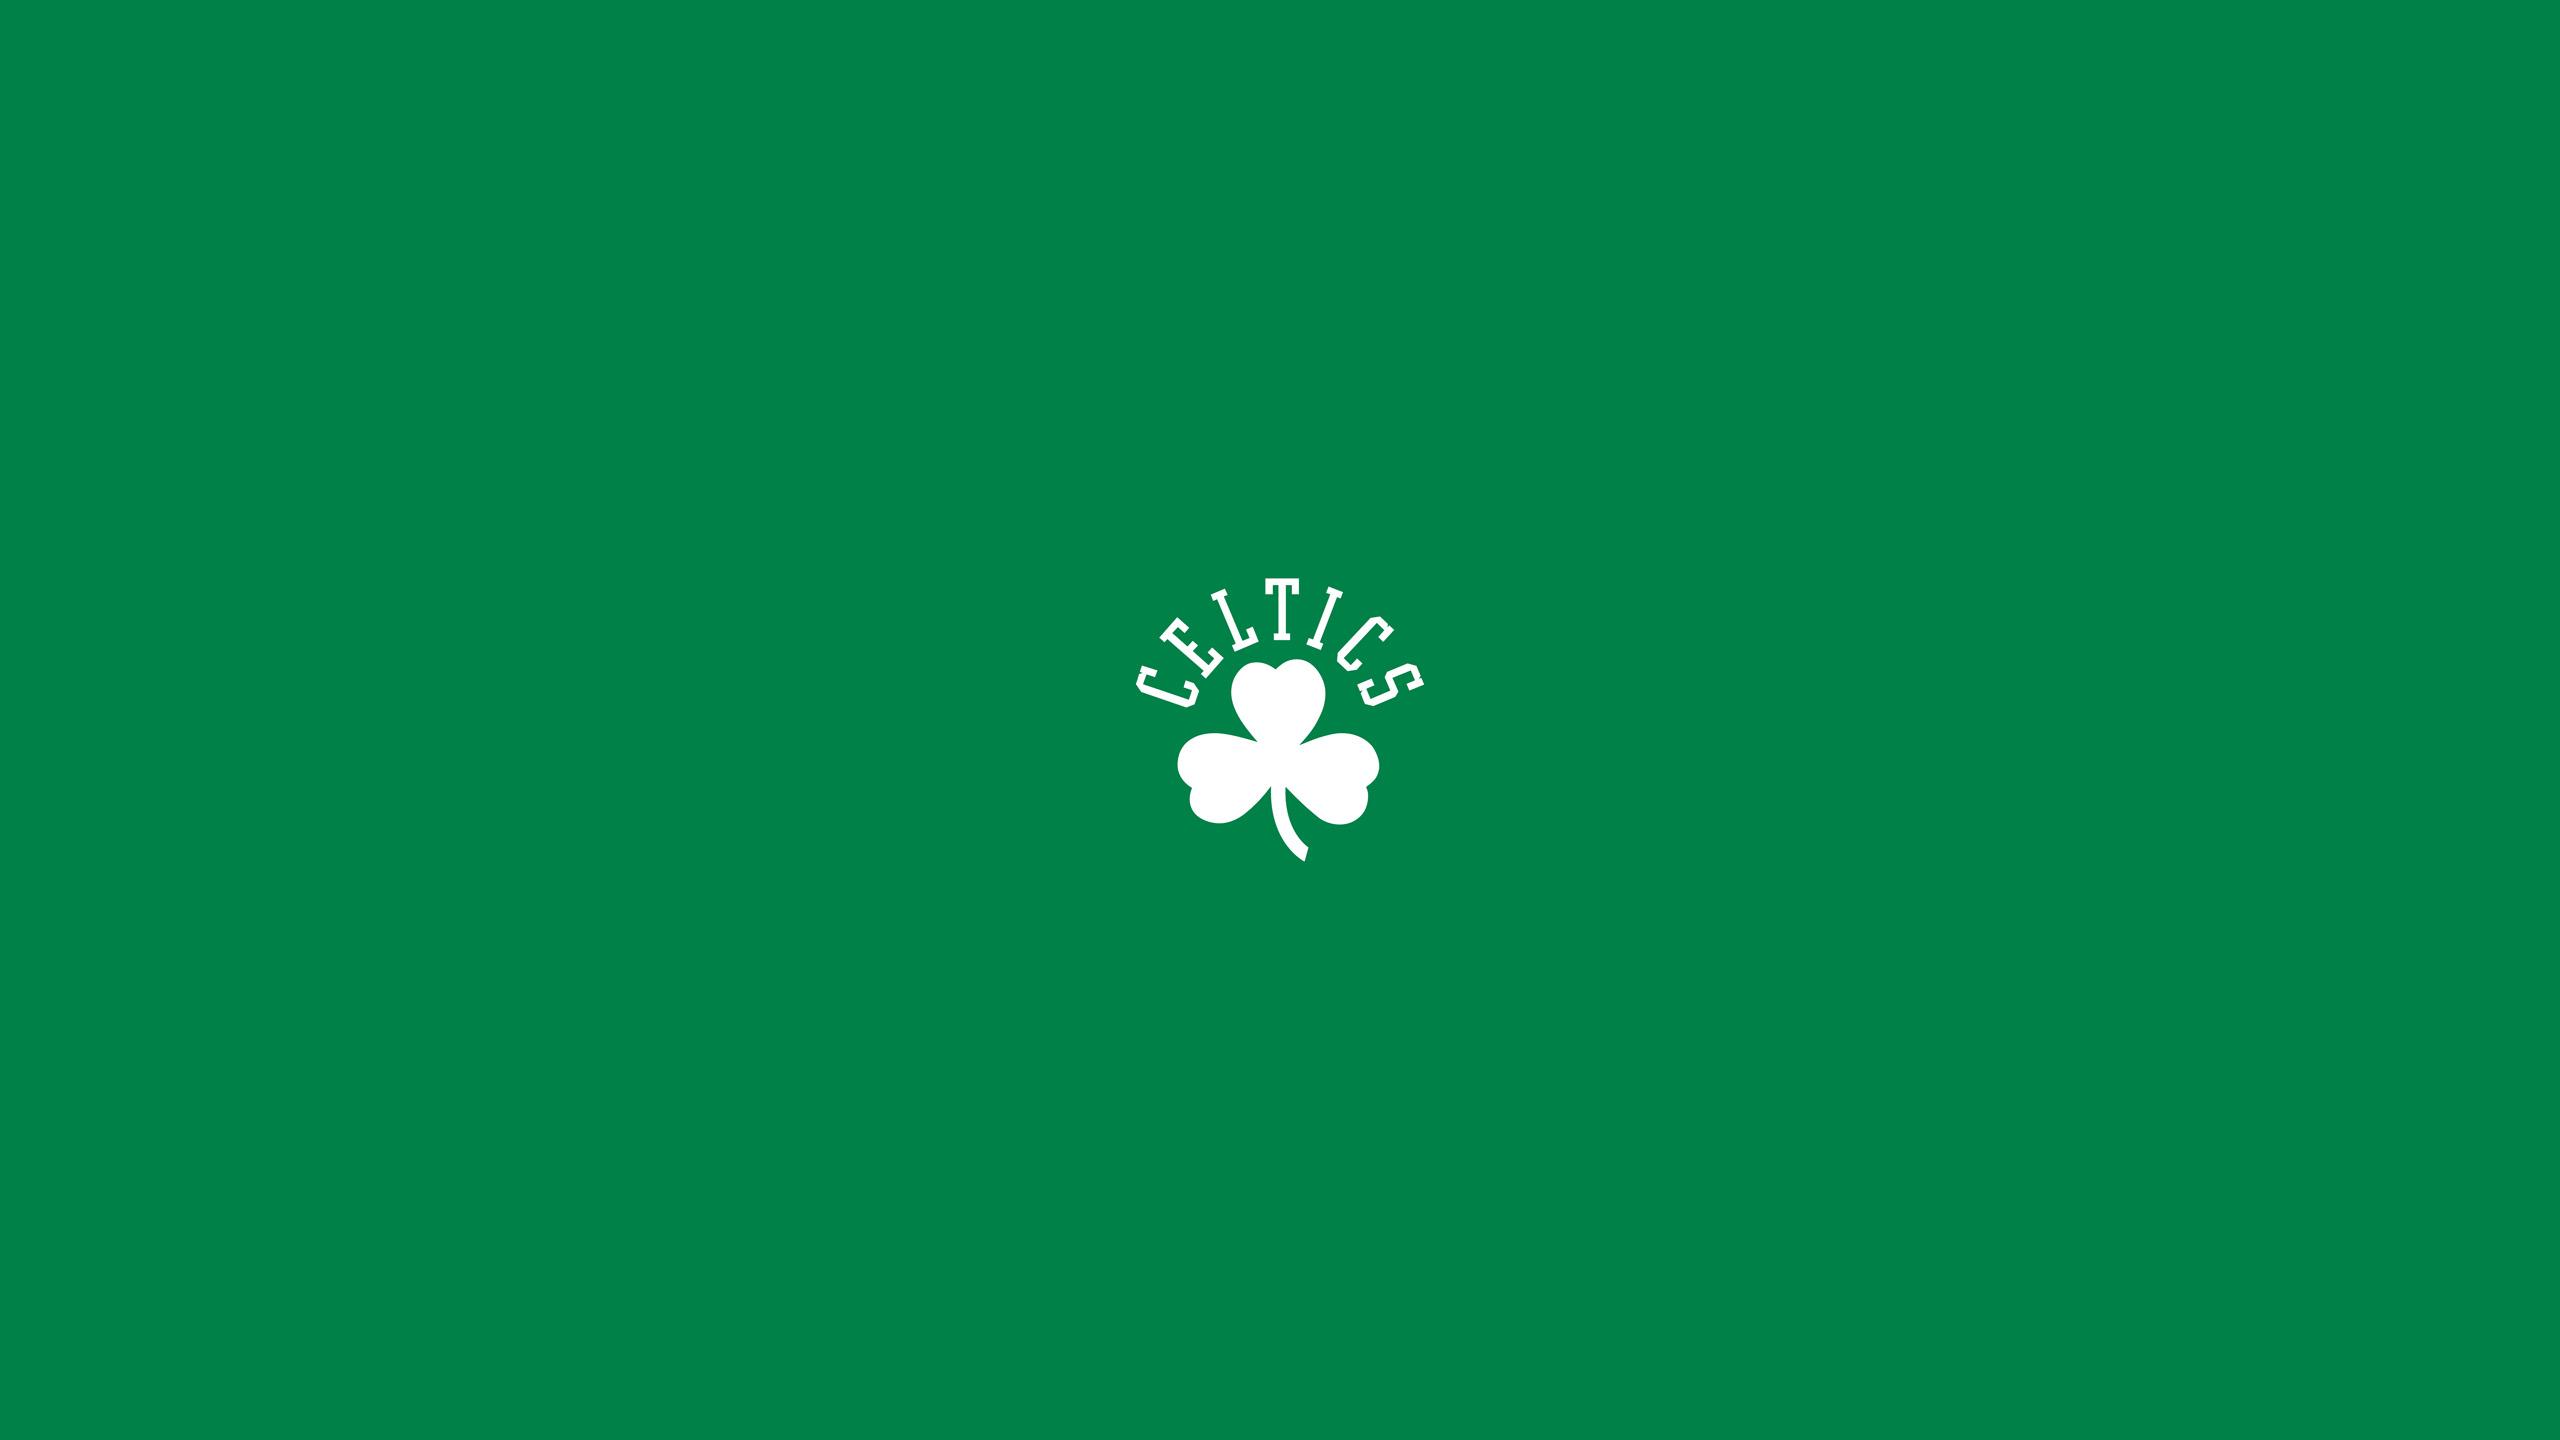 Boston Celtics 2560x1440